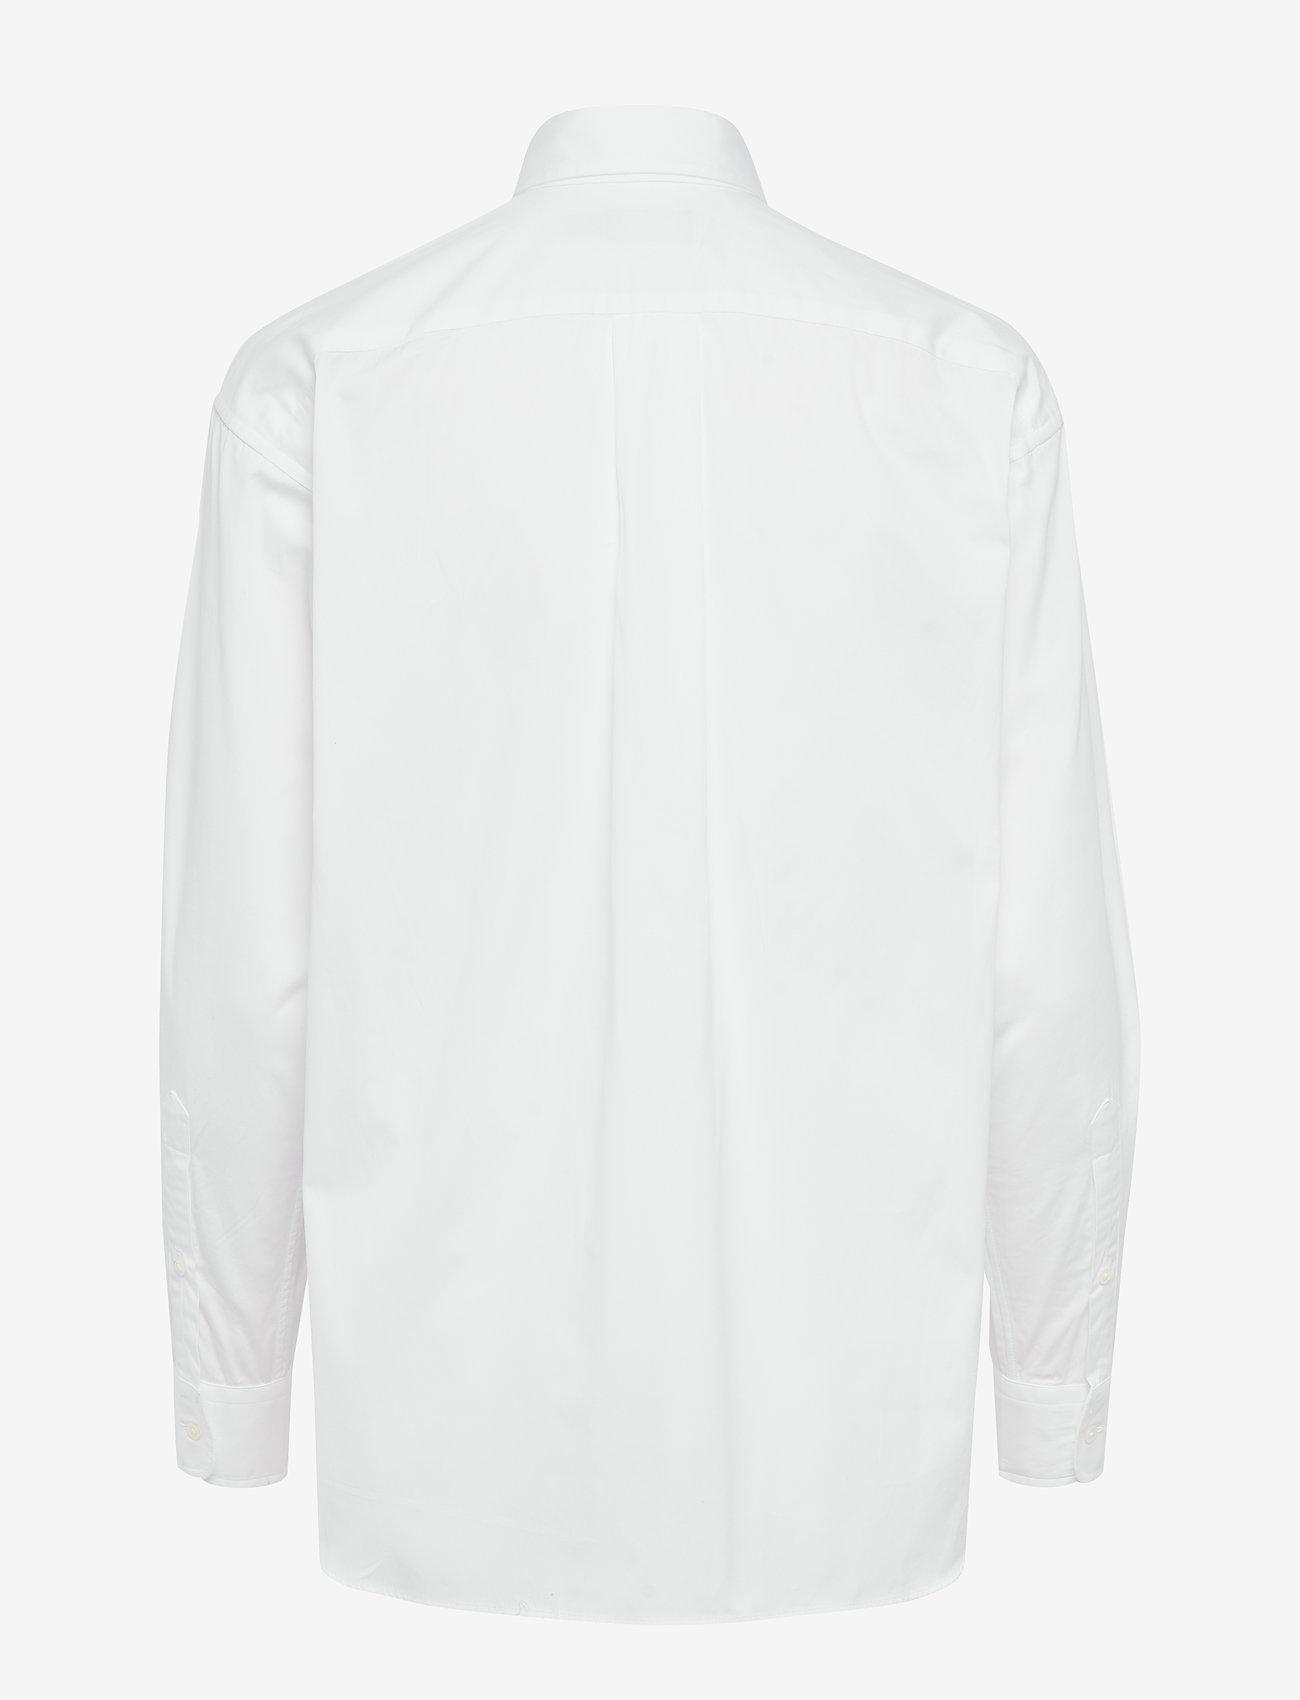 Cotton Broadcloth Shirt (White) - Polo Ralph Lauren q3FKw4